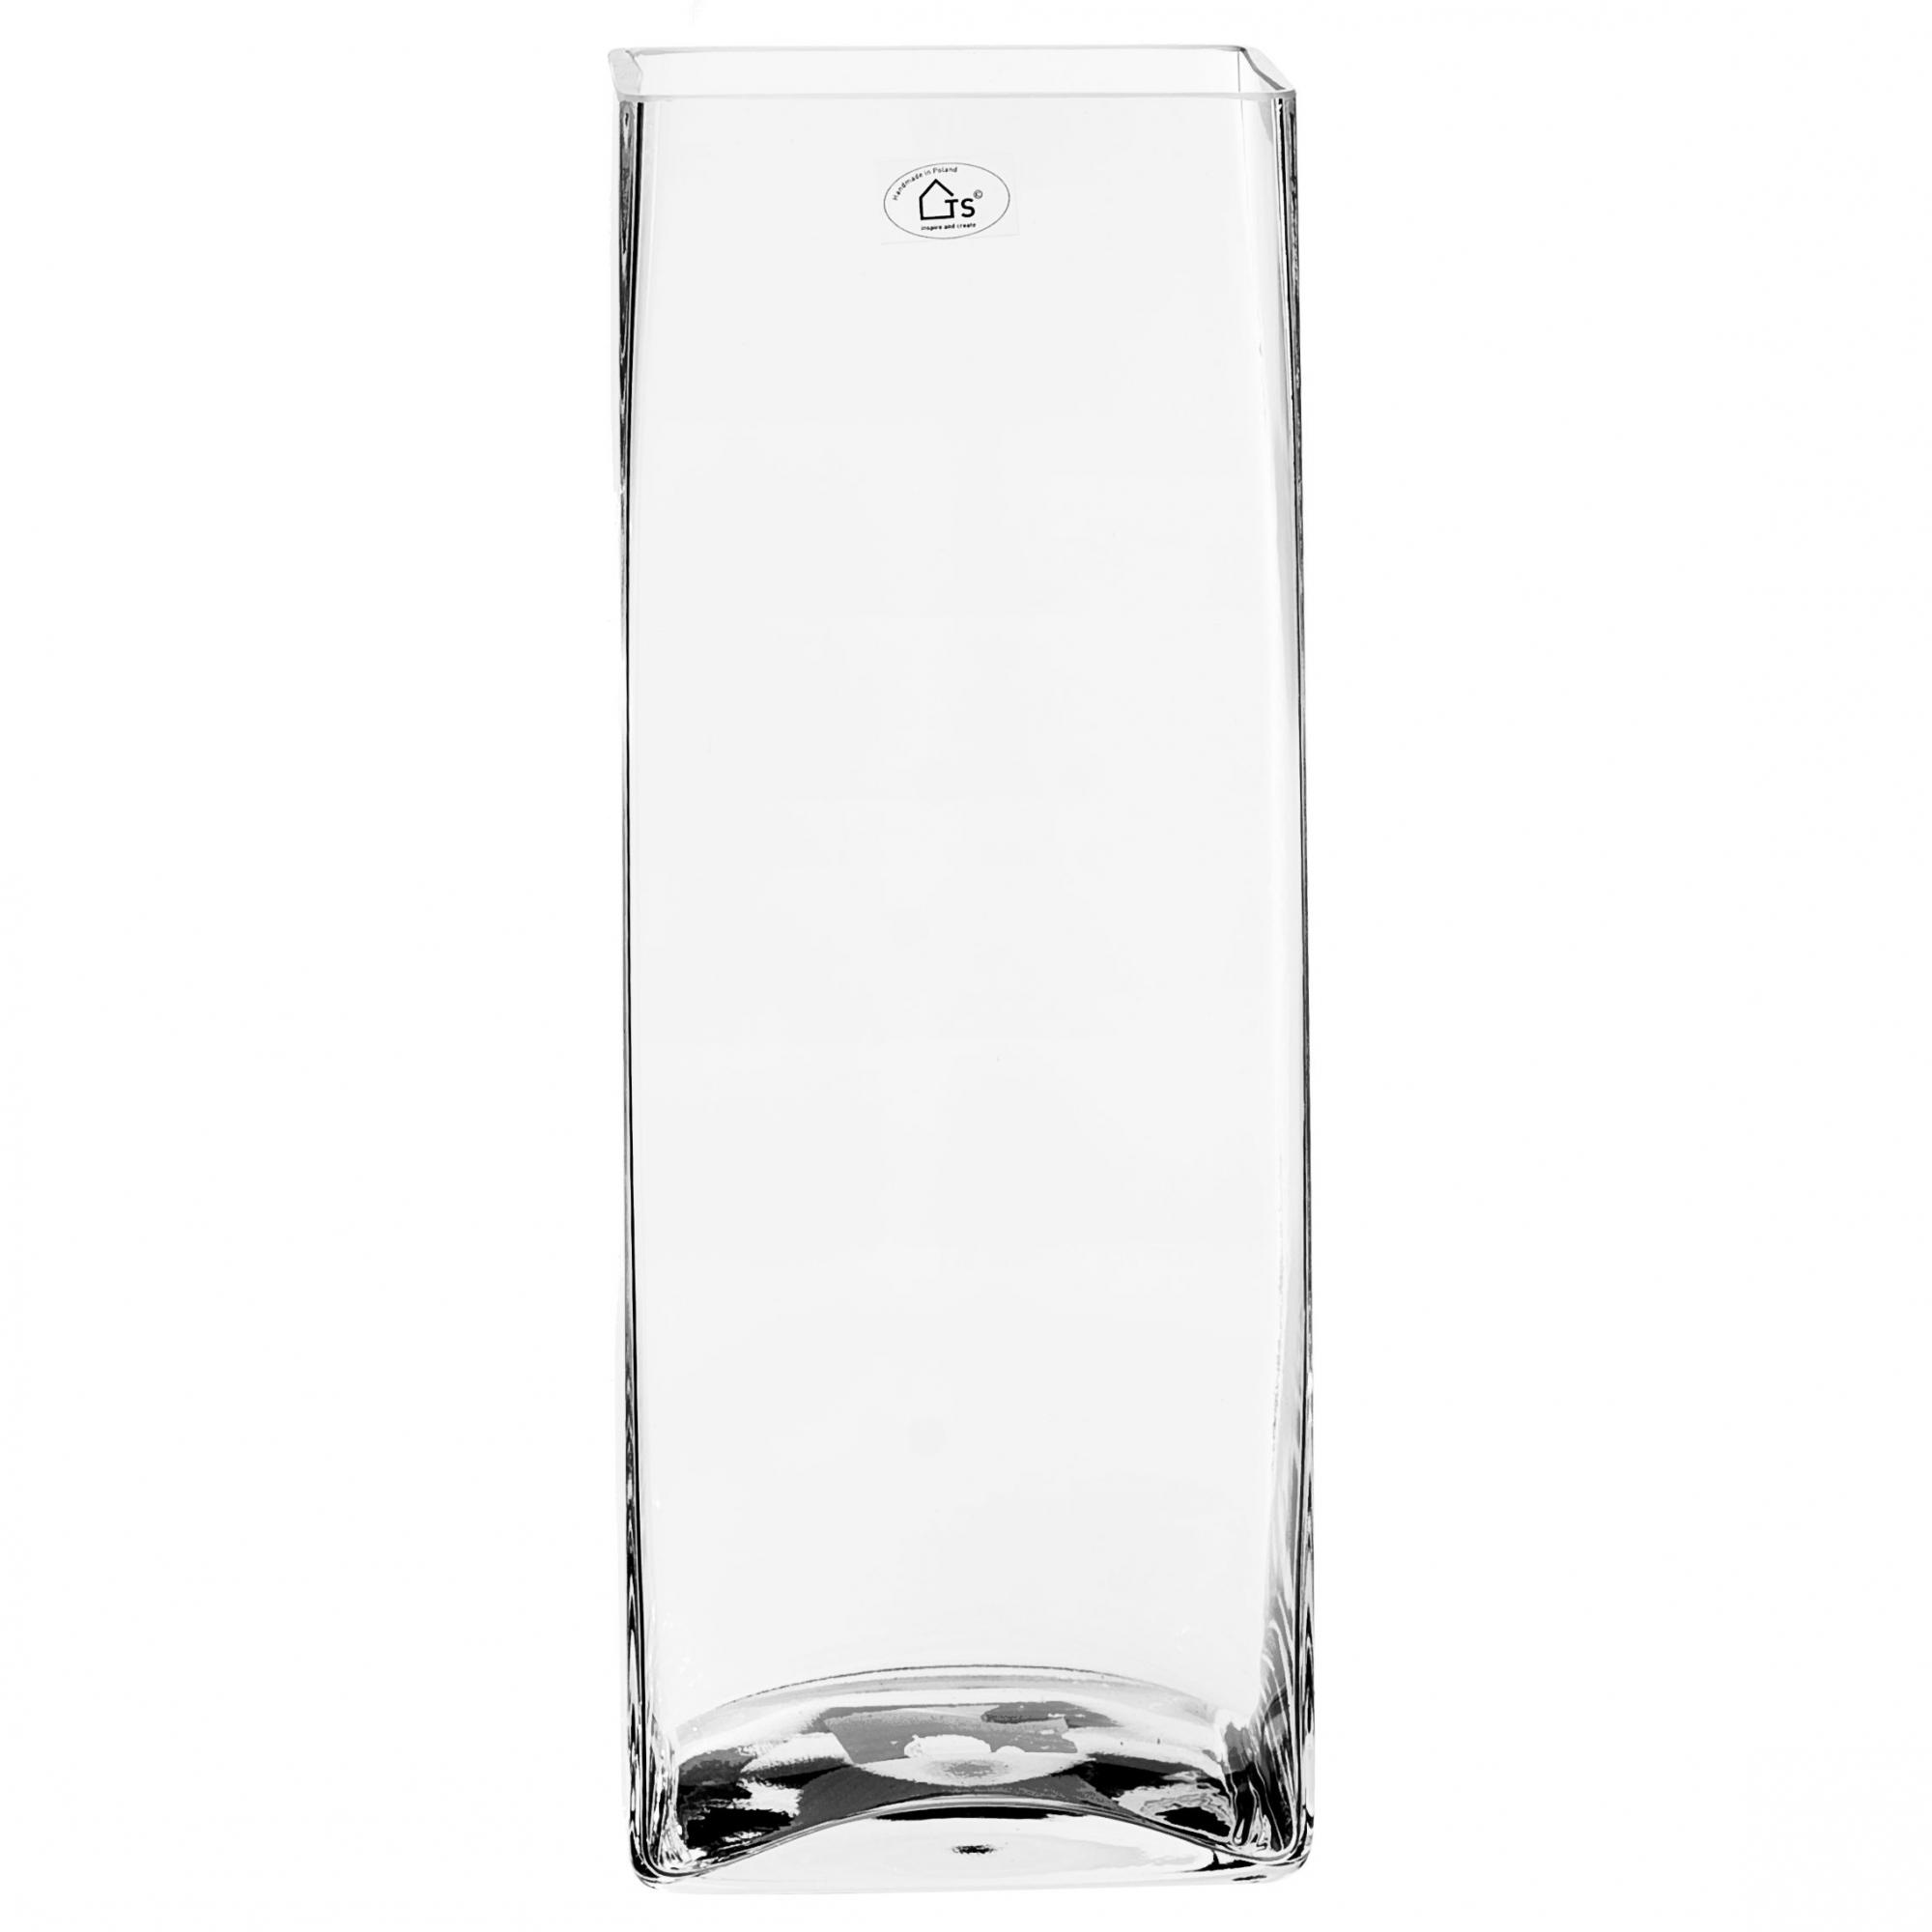 Vaso de Vidro Artesanal Polonês kwadrat 15x40cm